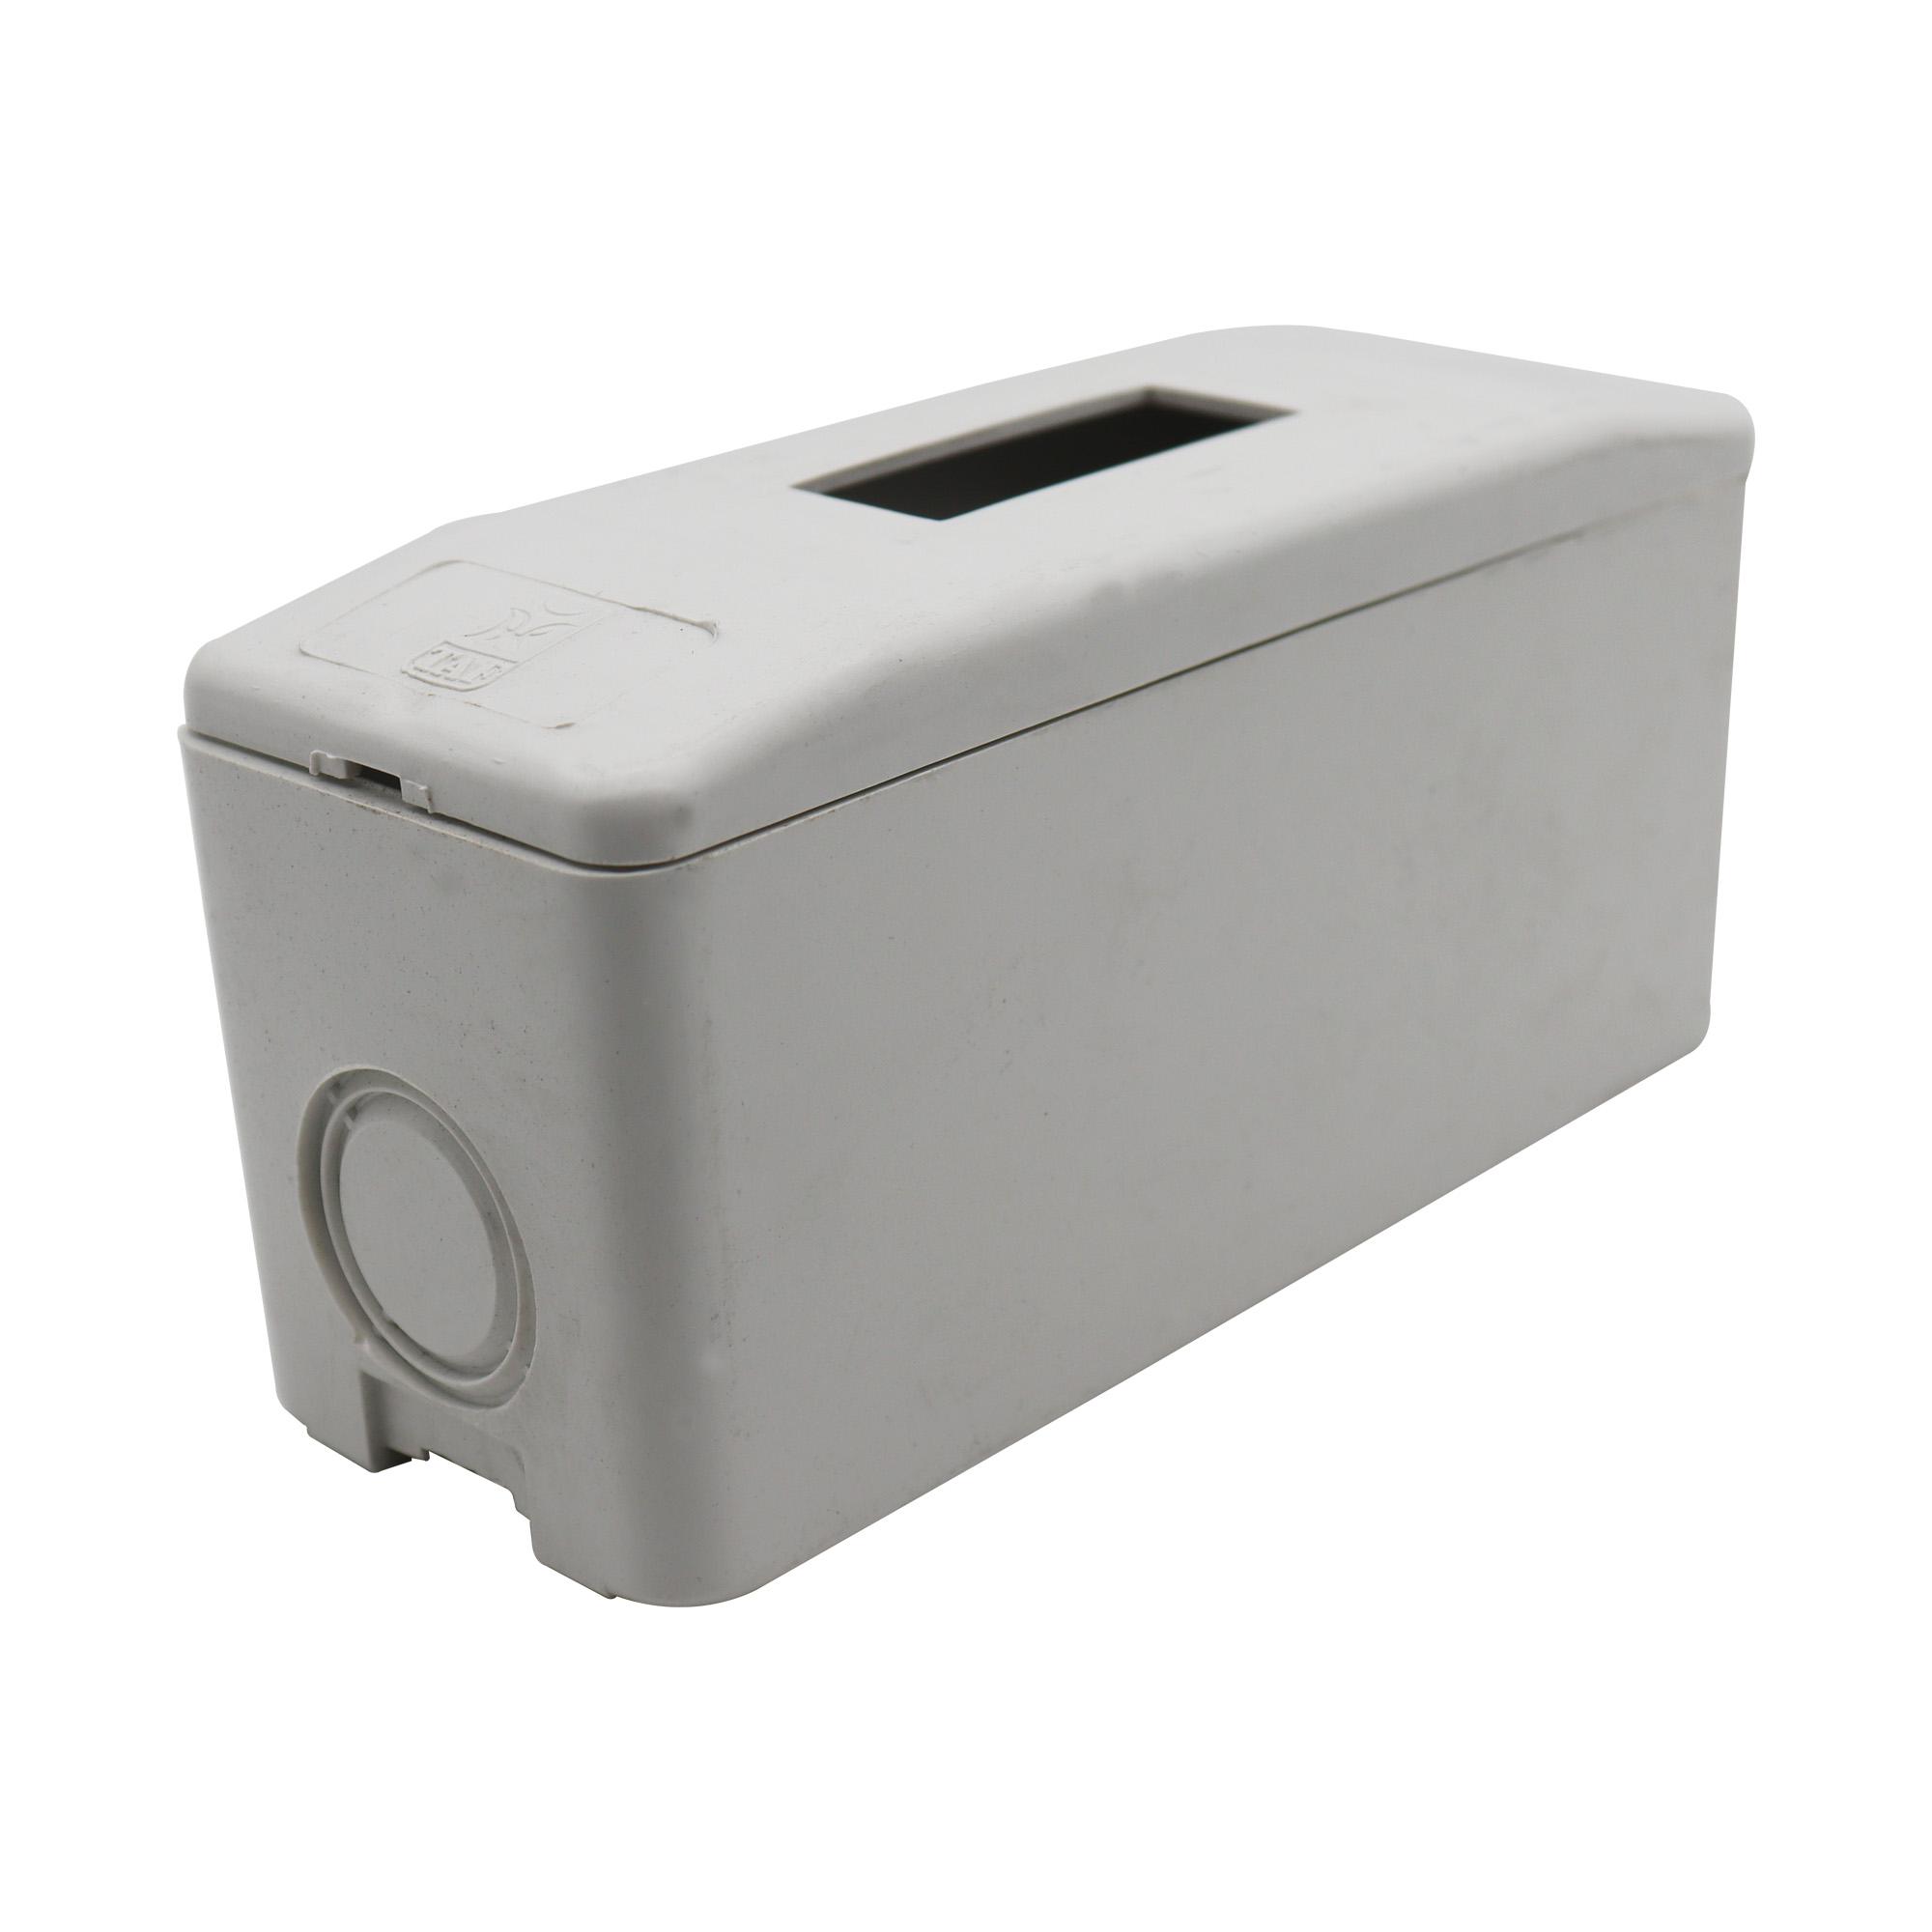 Caixa para Disjuntor - TAF 01